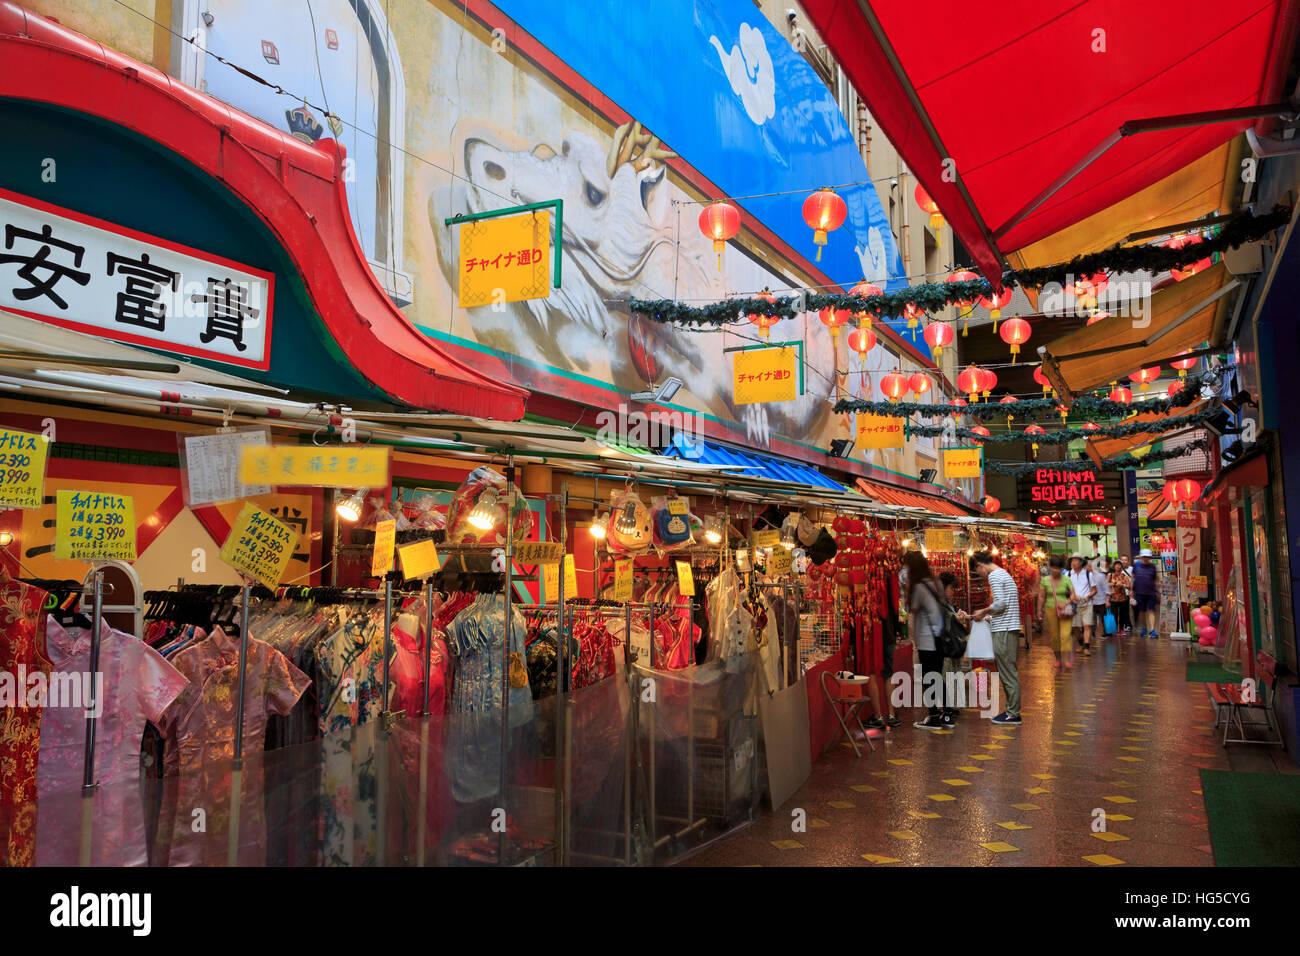 Chinatown, Yokohama, Honshu Island, Japan, Asia - Stock Image